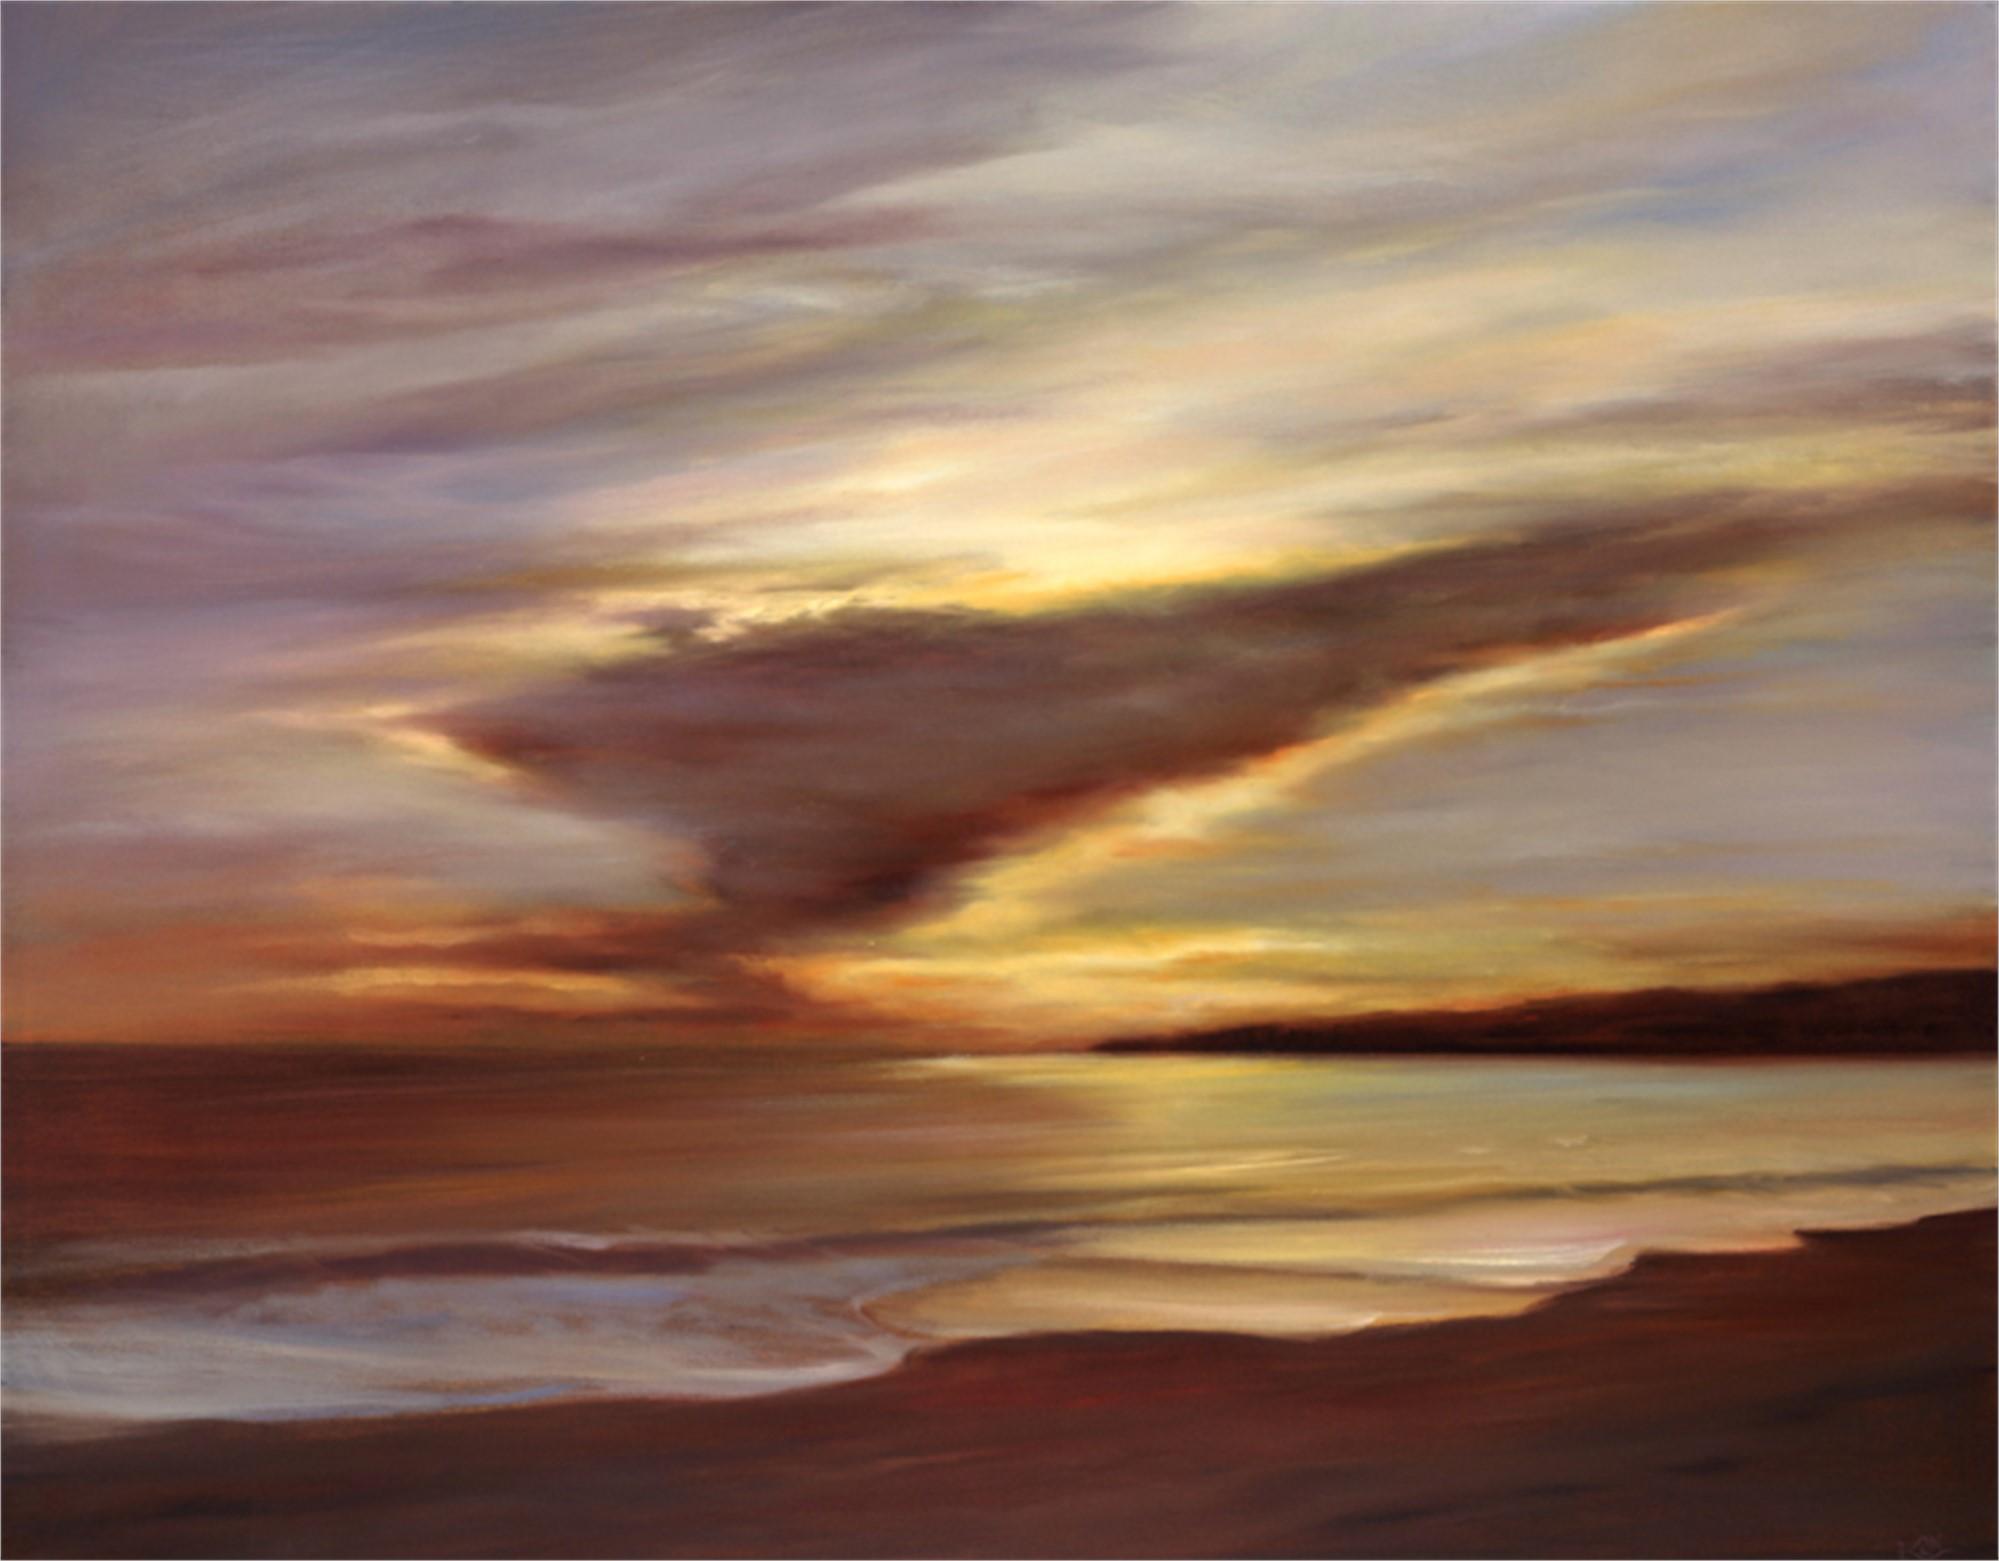 Peaceful Shore (SN) by Cheryl Kline